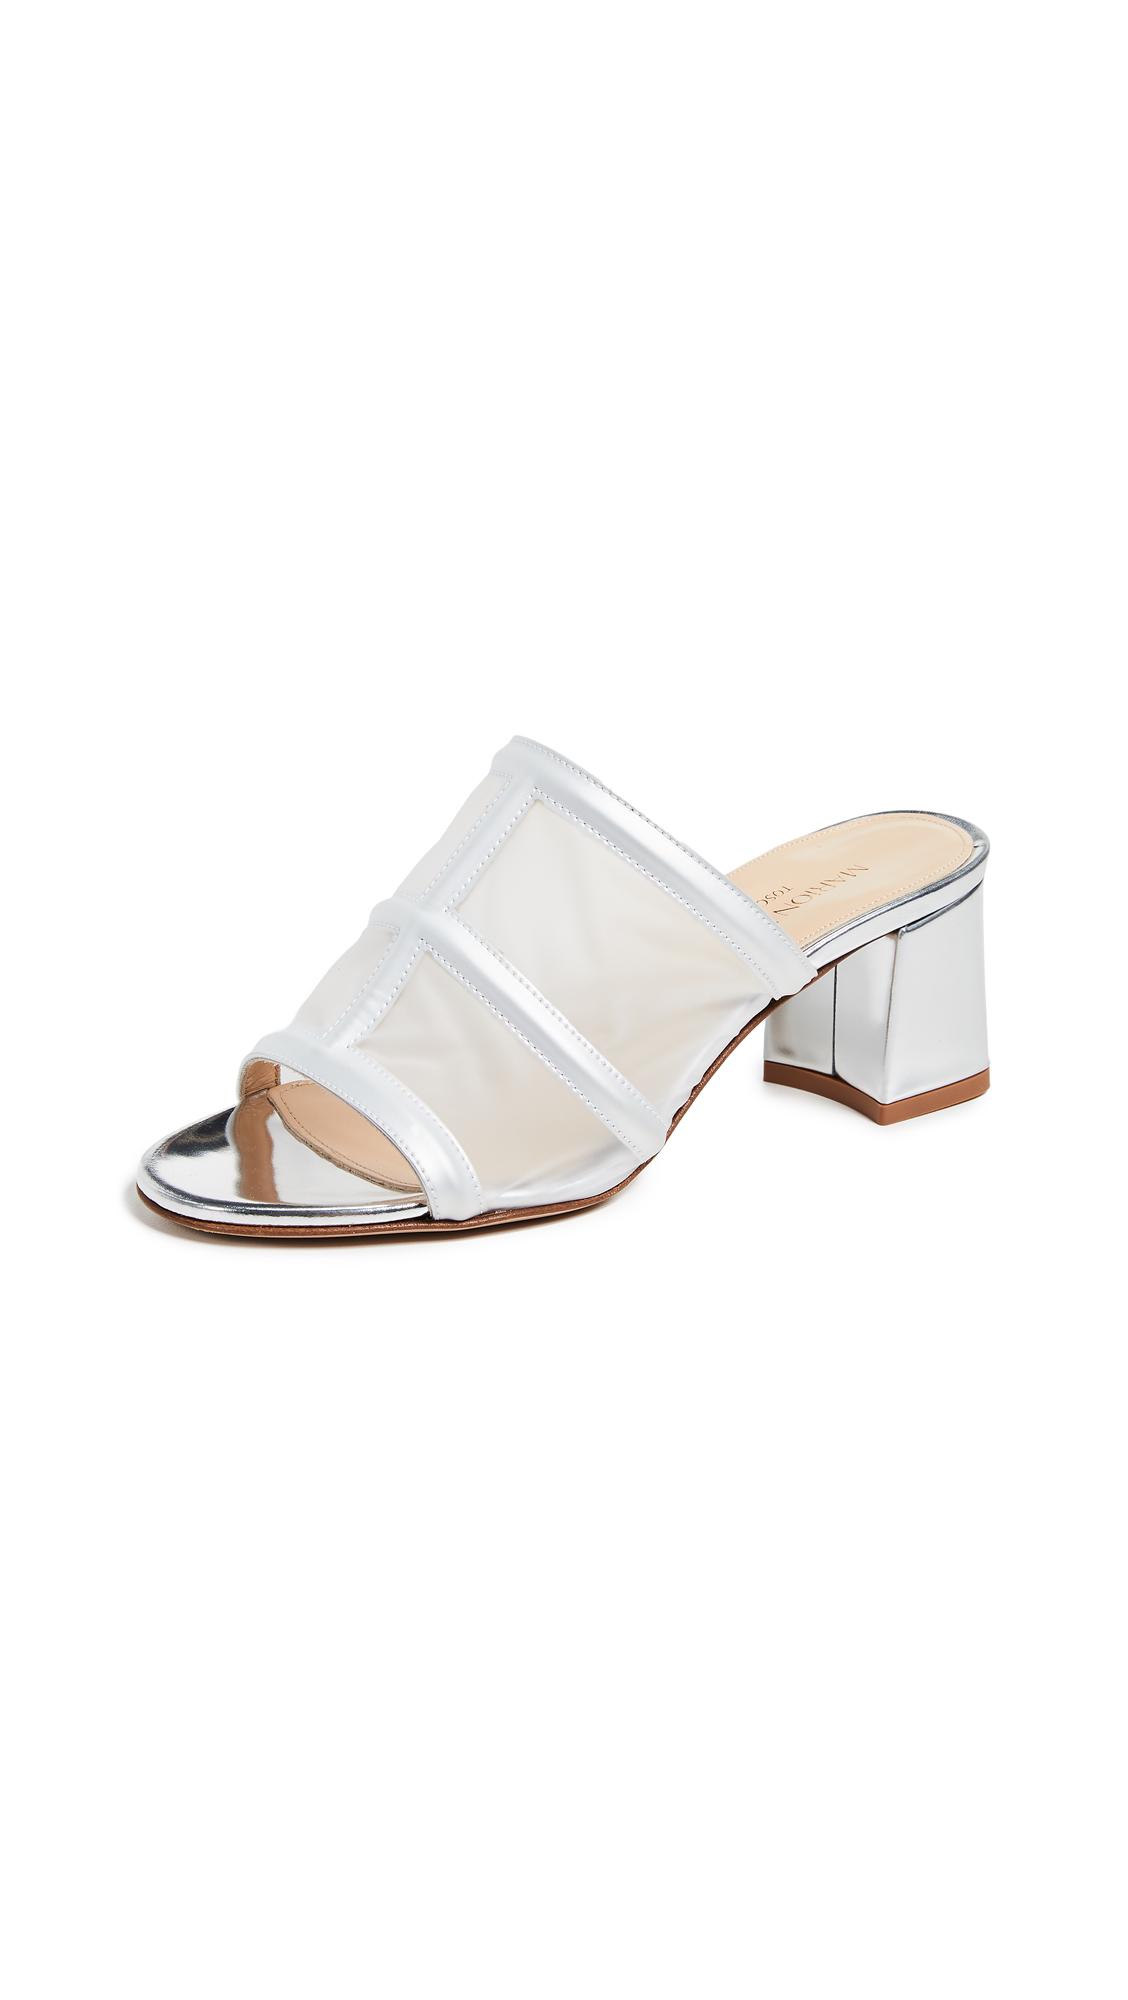 Marion Parke Bea Slides - Silver Mirror